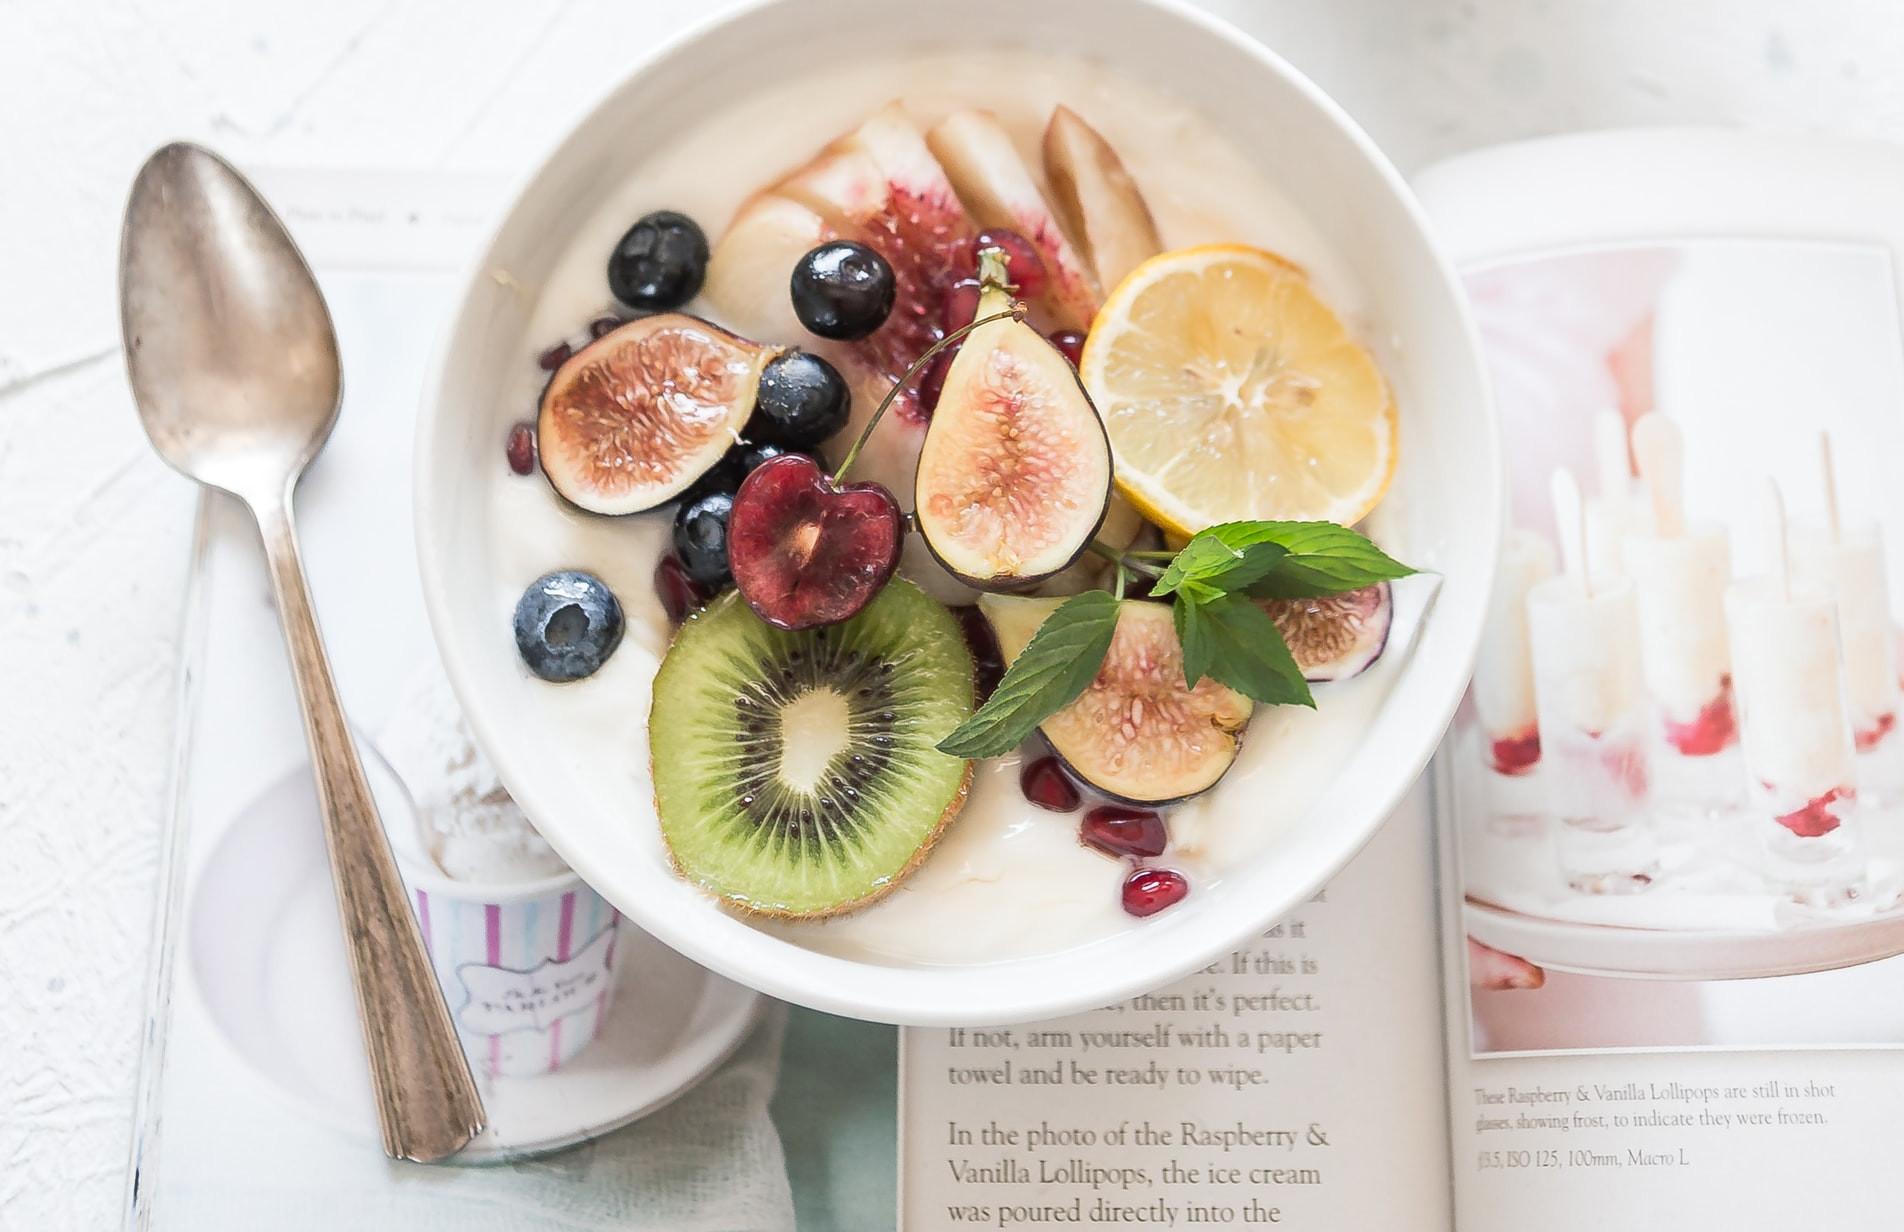 eat breakfast everyday